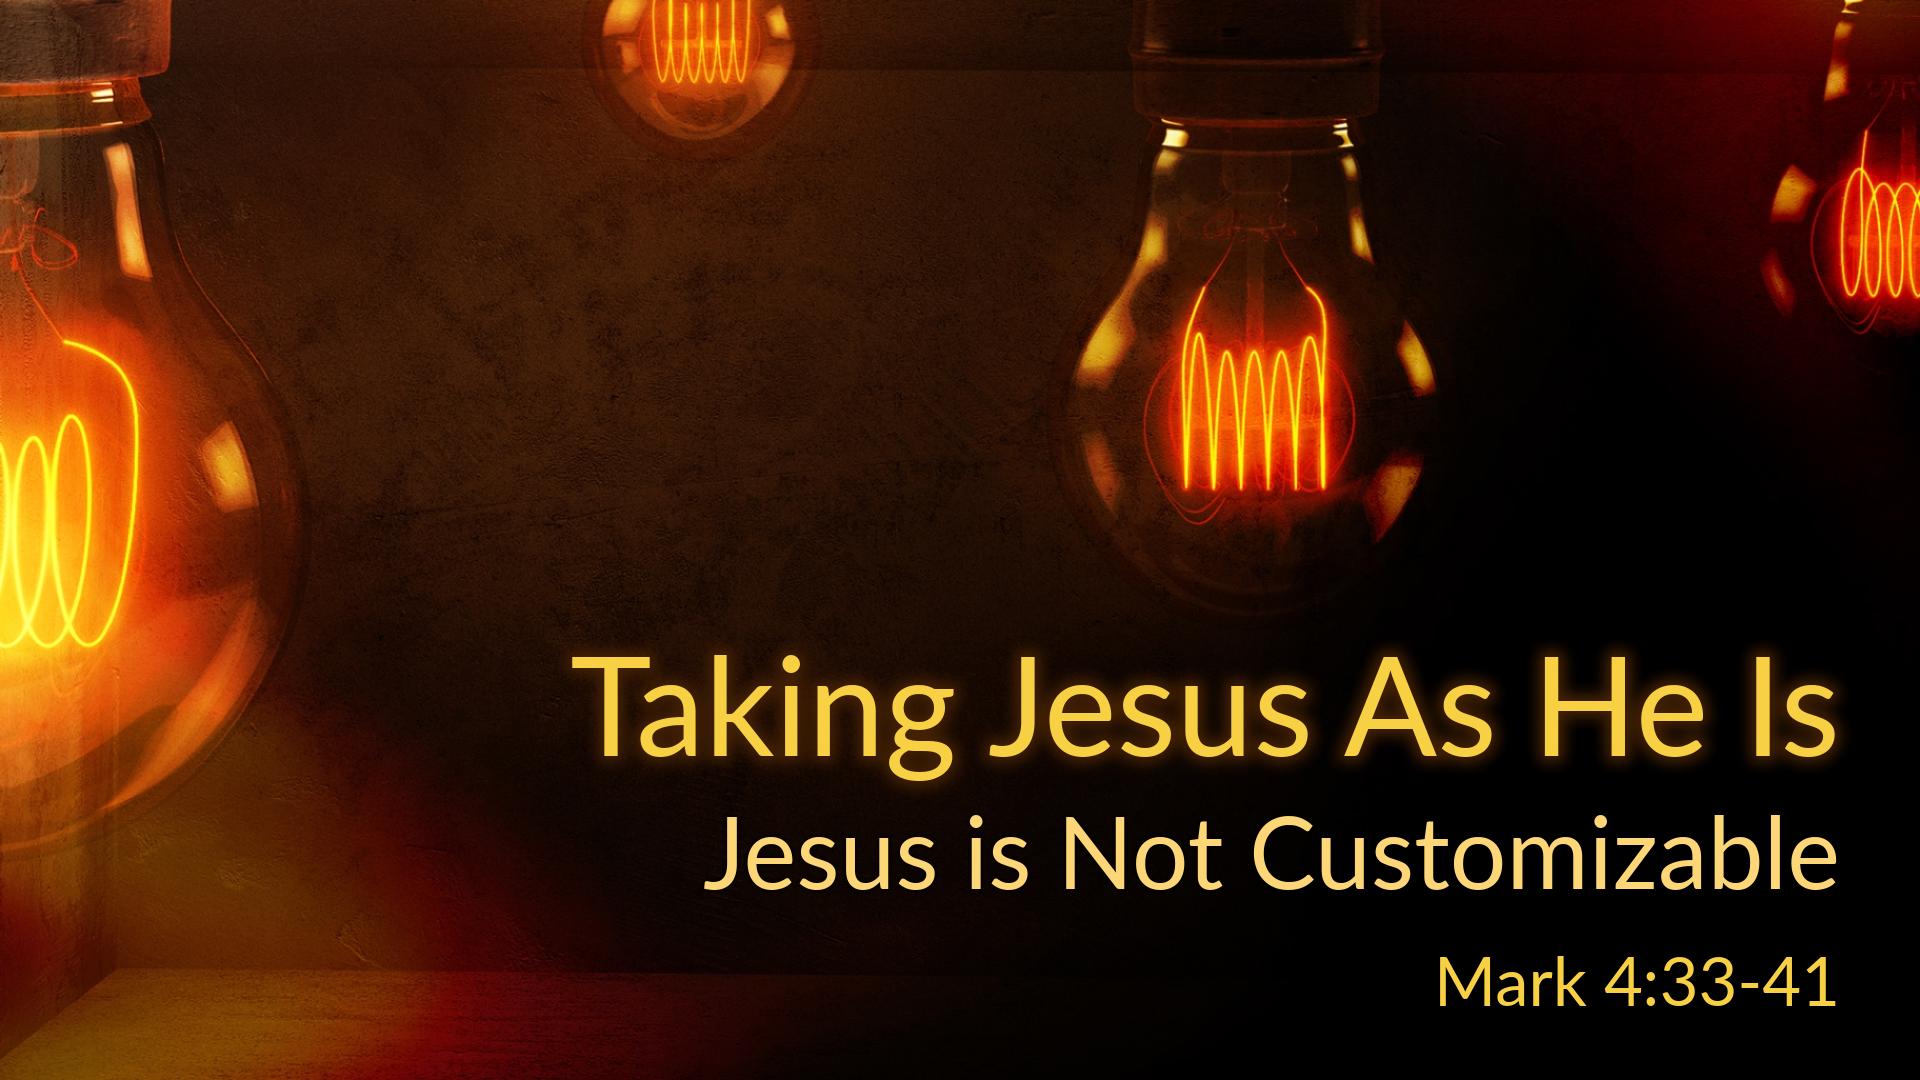 Jesus is Not Customizable